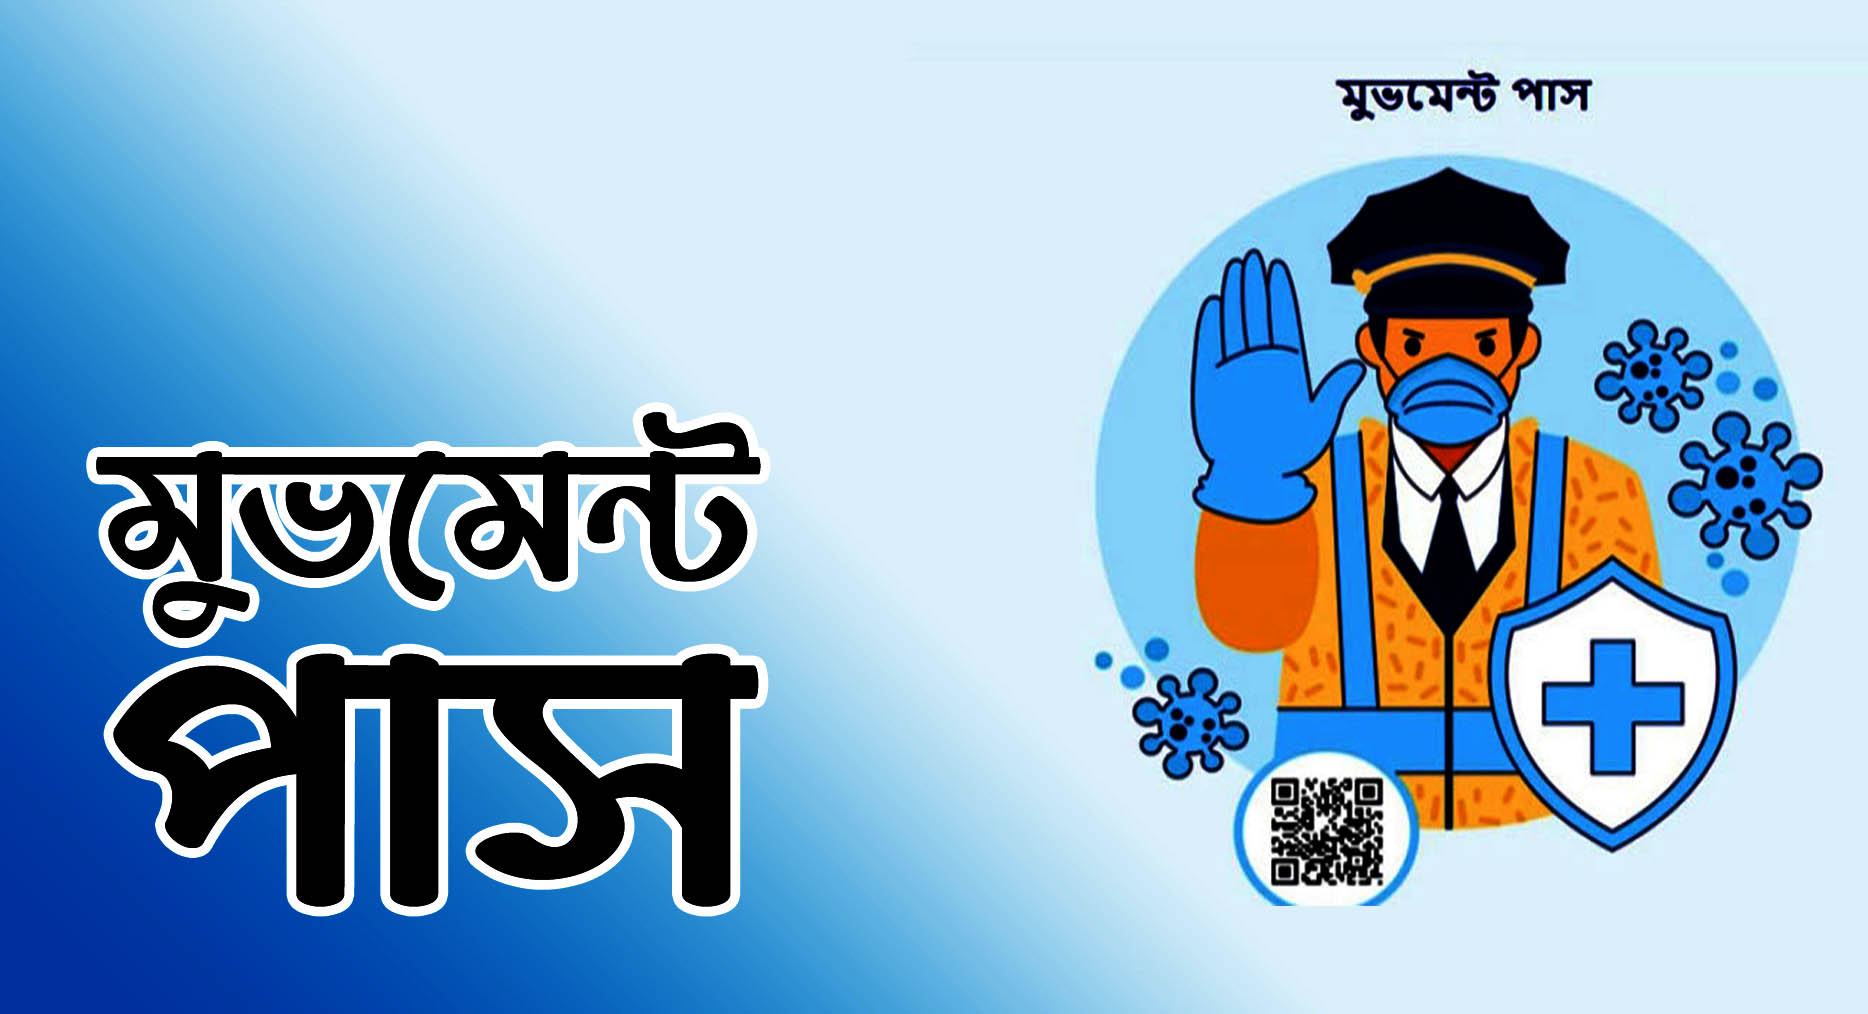 Movement Pass Application App Police Gov BD